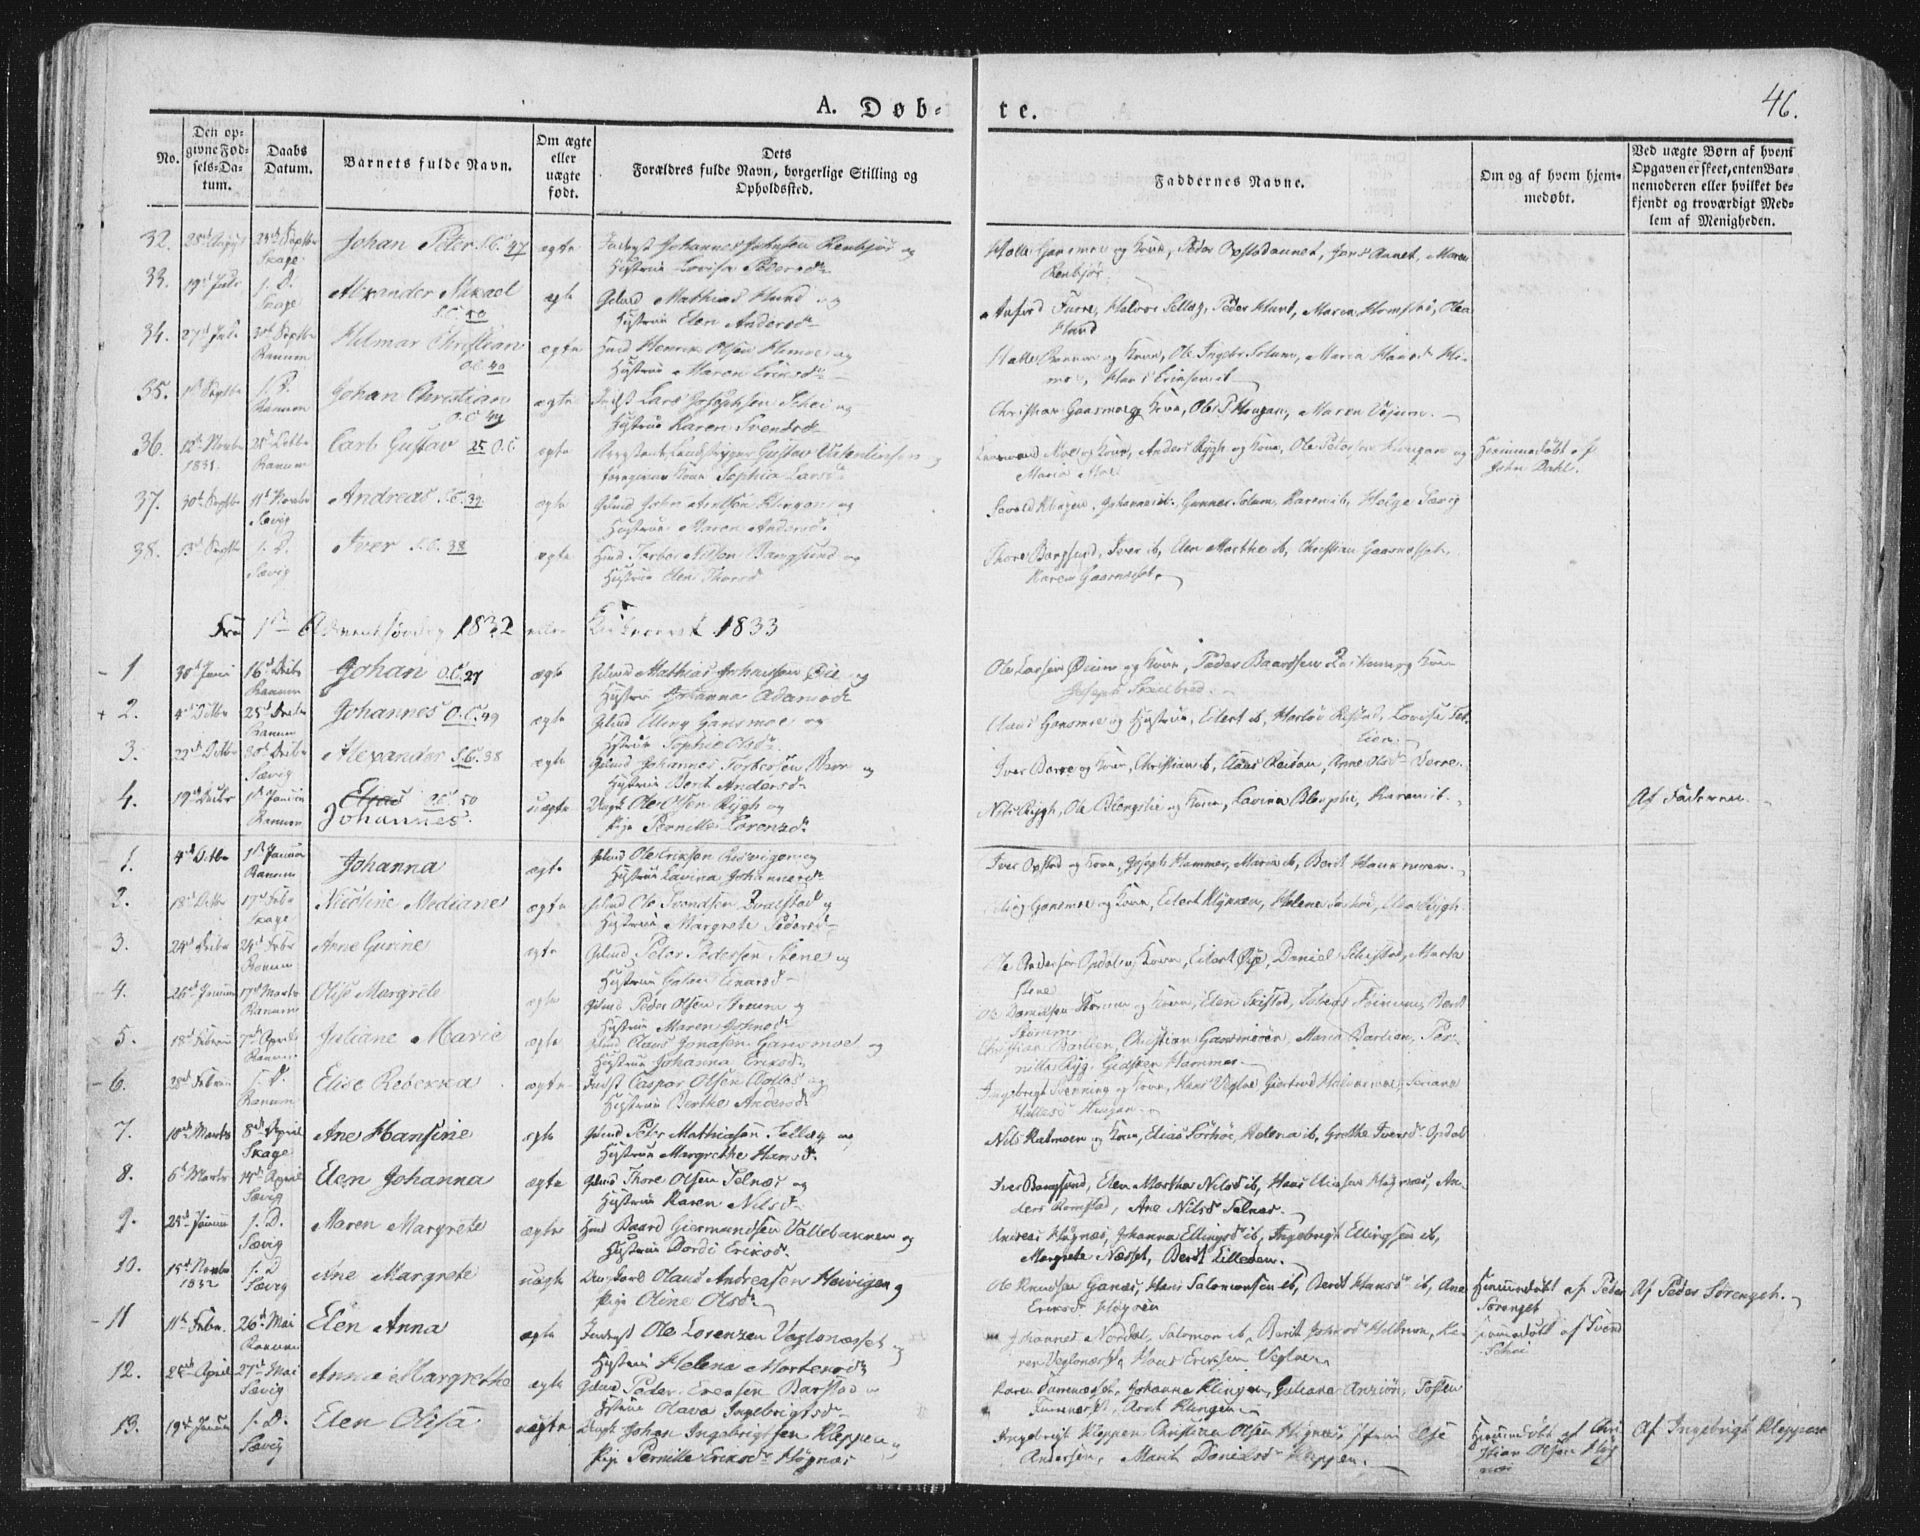 SAT, Ministerialprotokoller, klokkerbøker og fødselsregistre - Nord-Trøndelag, 764/L0551: Ministerialbok nr. 764A07a, 1824-1864, s. 46